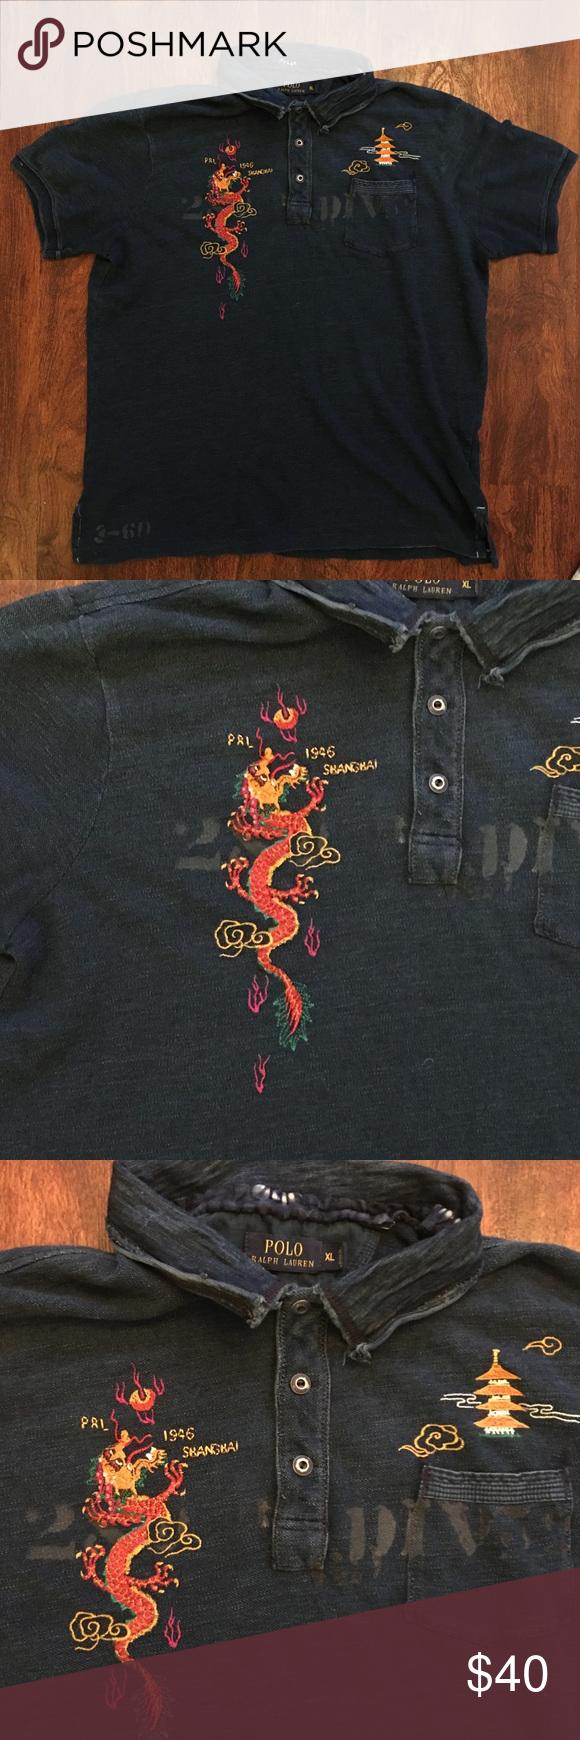 "Good Condition Sz Xl Shirt ""1946 Shanghai"" Used In Polo Ralph Lauren OPkn0w"